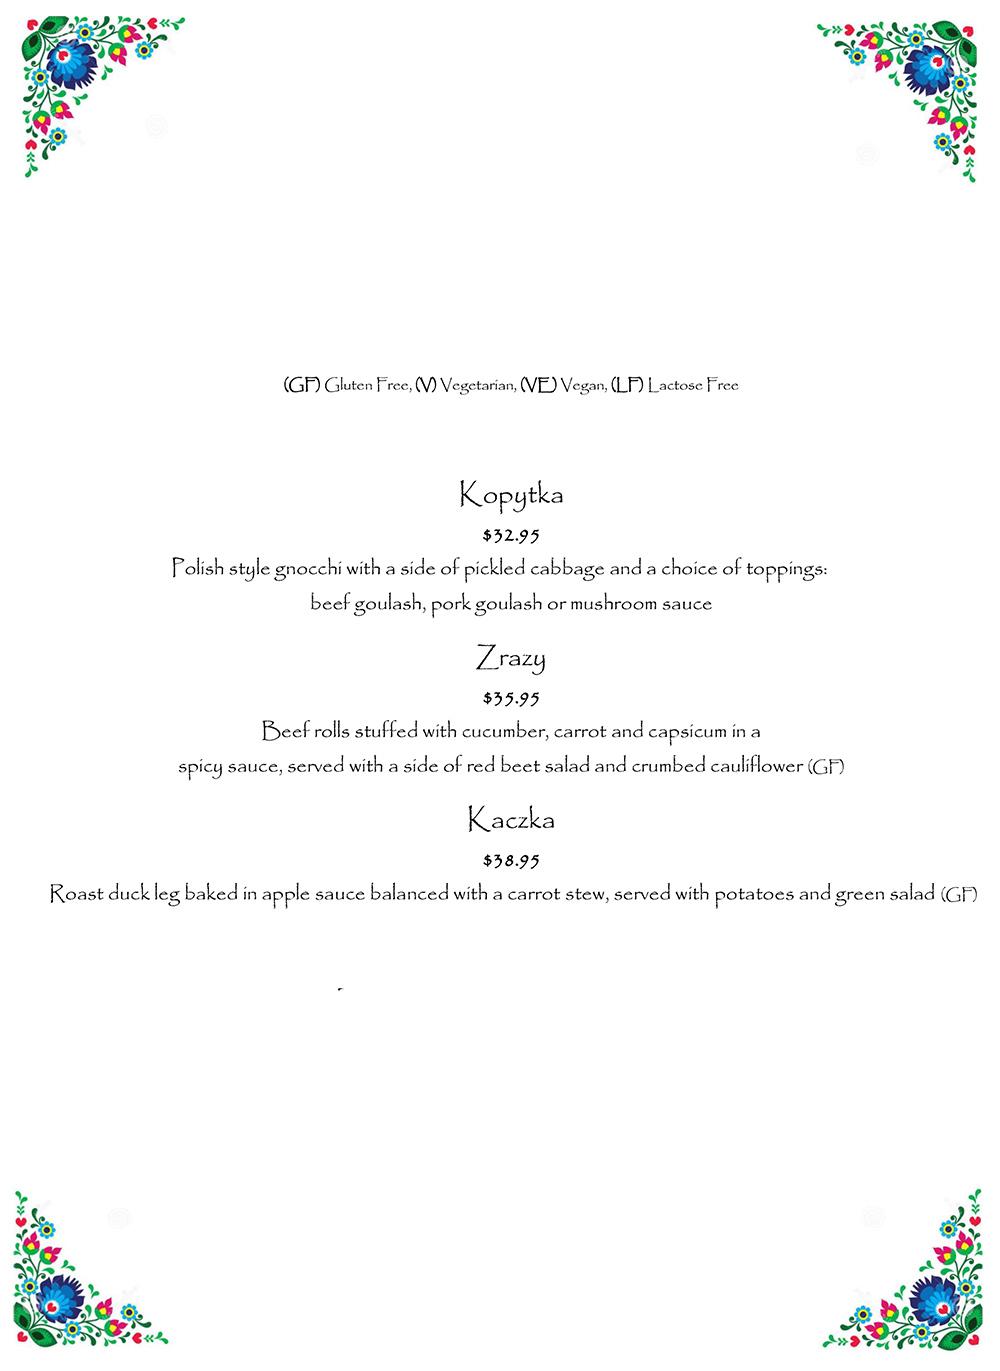 KluskaRestaurant_Menu-POLISH CLASSICS3